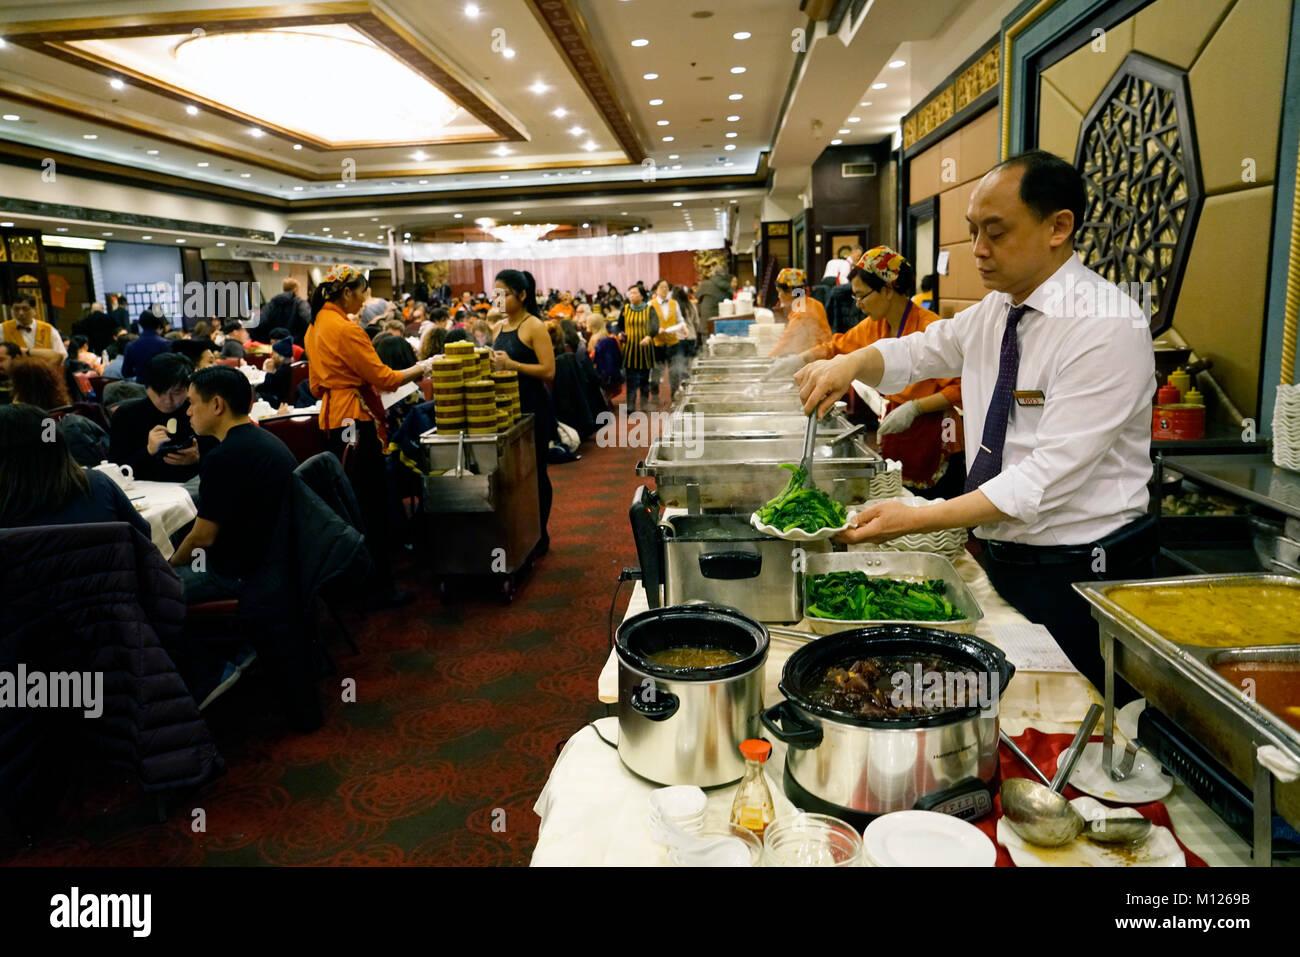 Crowded Restaurant Stock Photos & Crowded Restaurant Stock ...